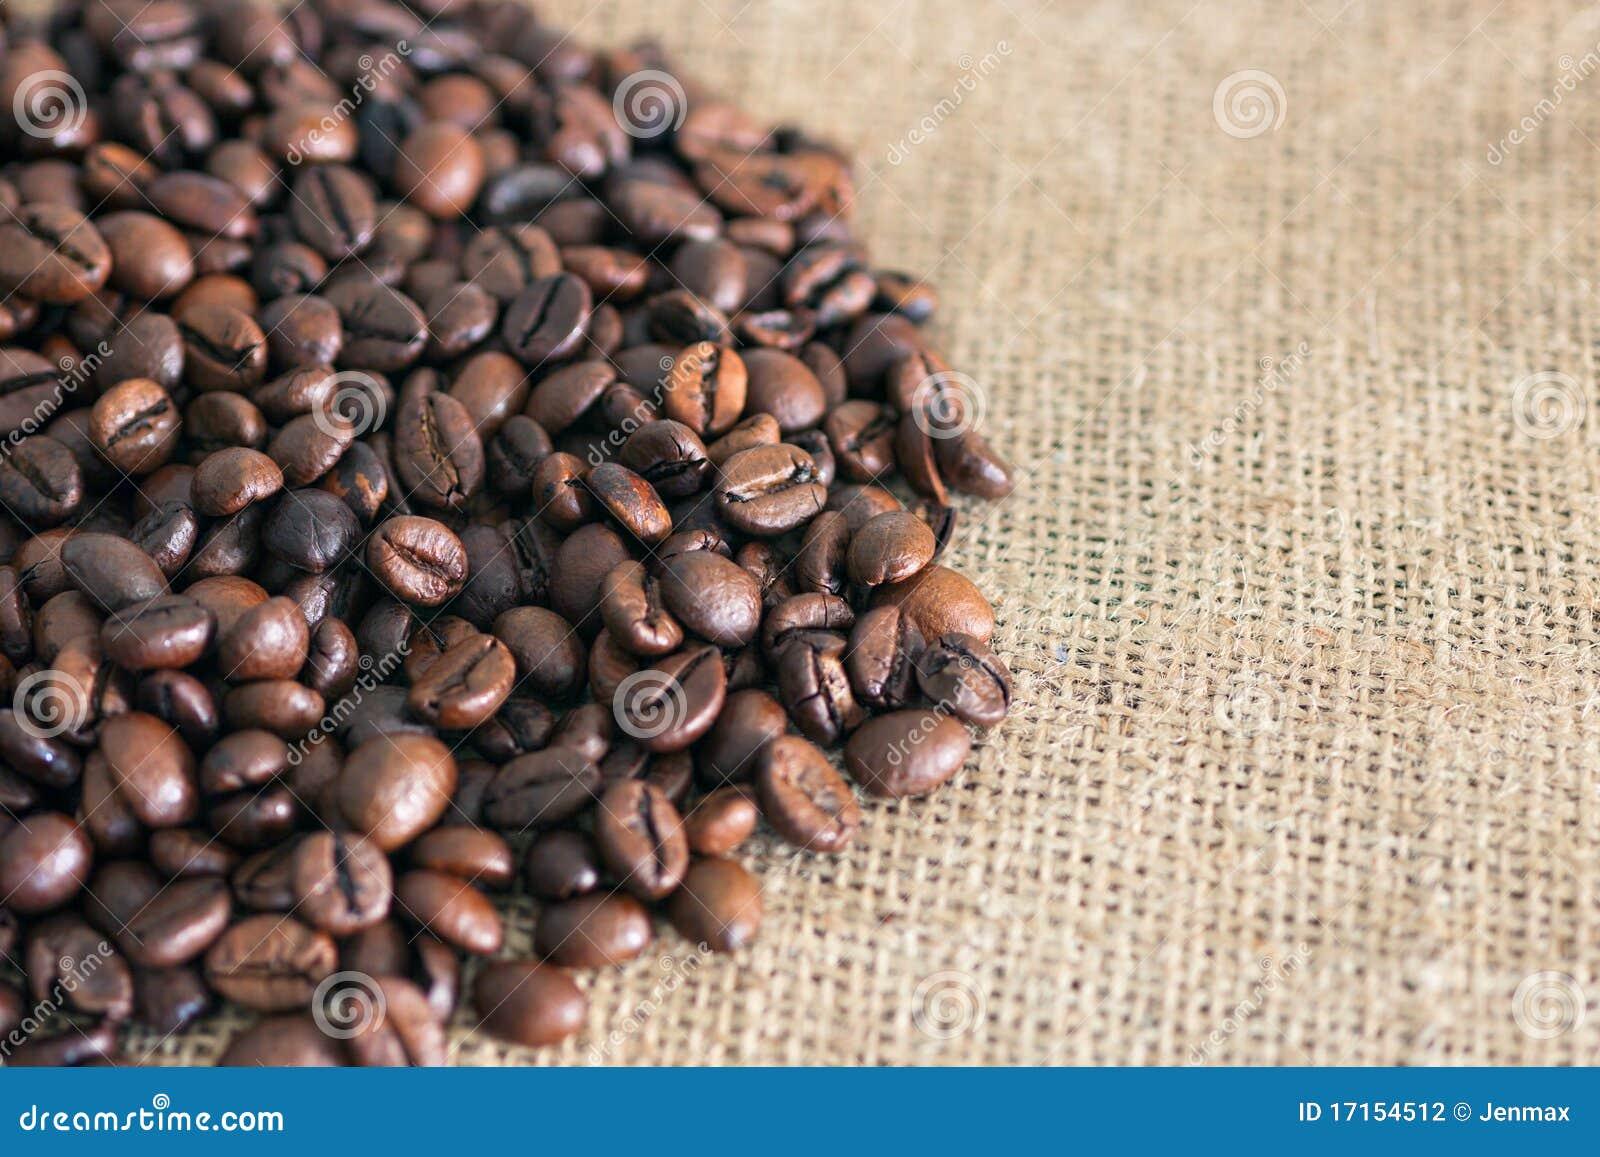 high res black coffee - photo #12